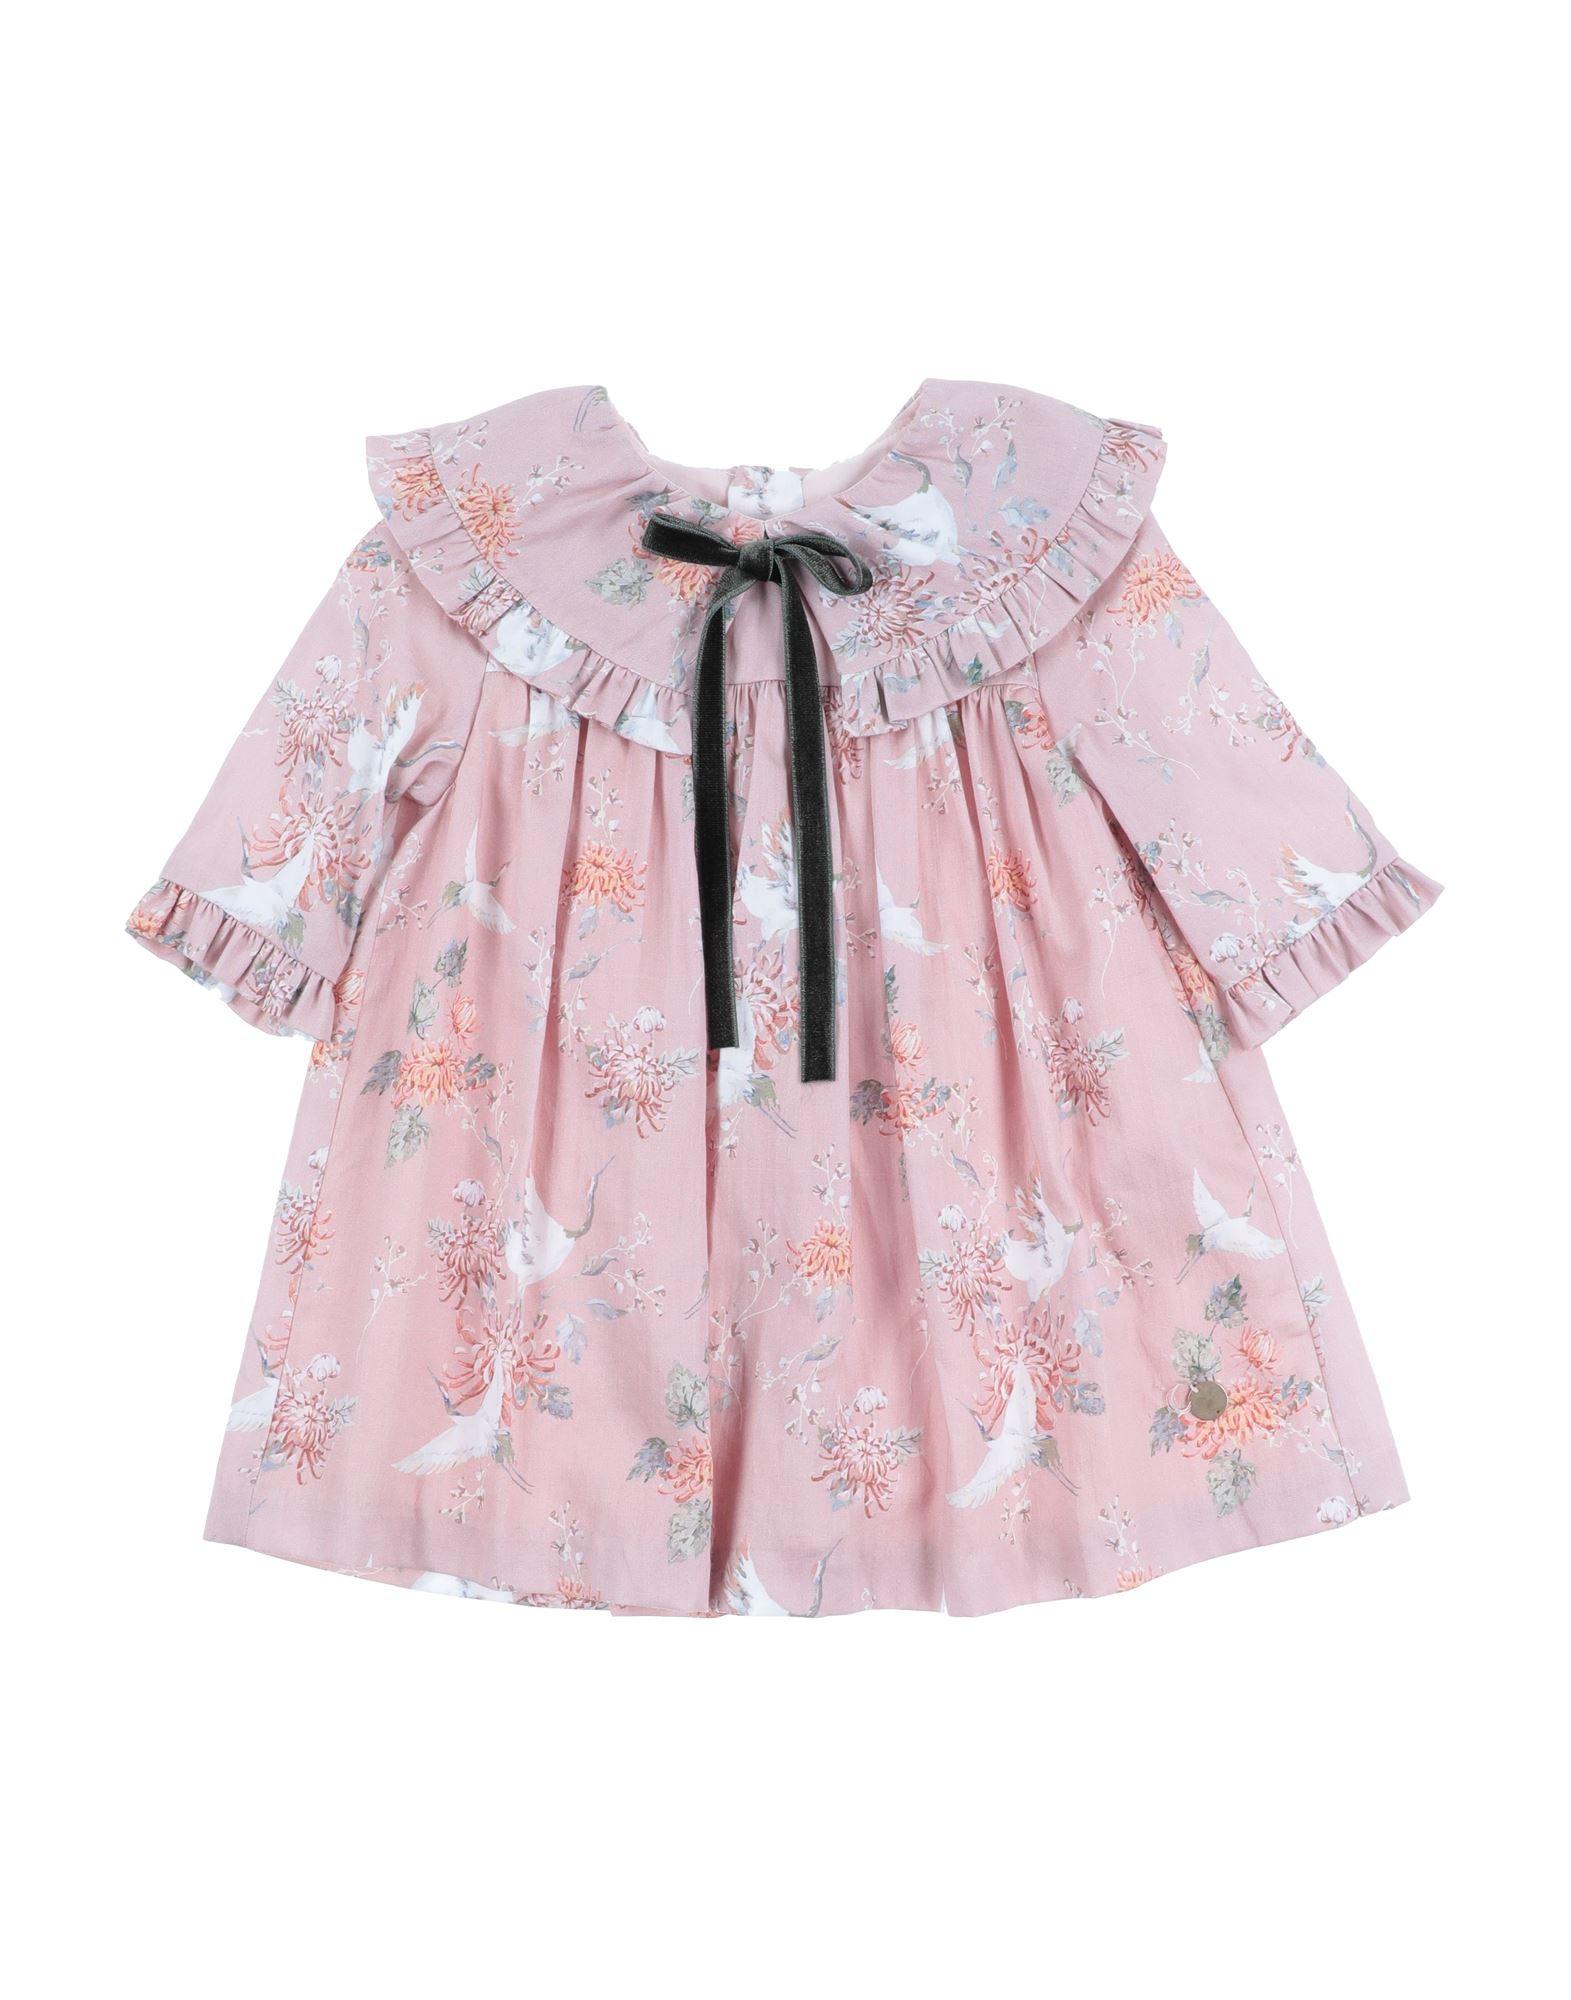 PILI CARRERA Dresses - Item 15126025